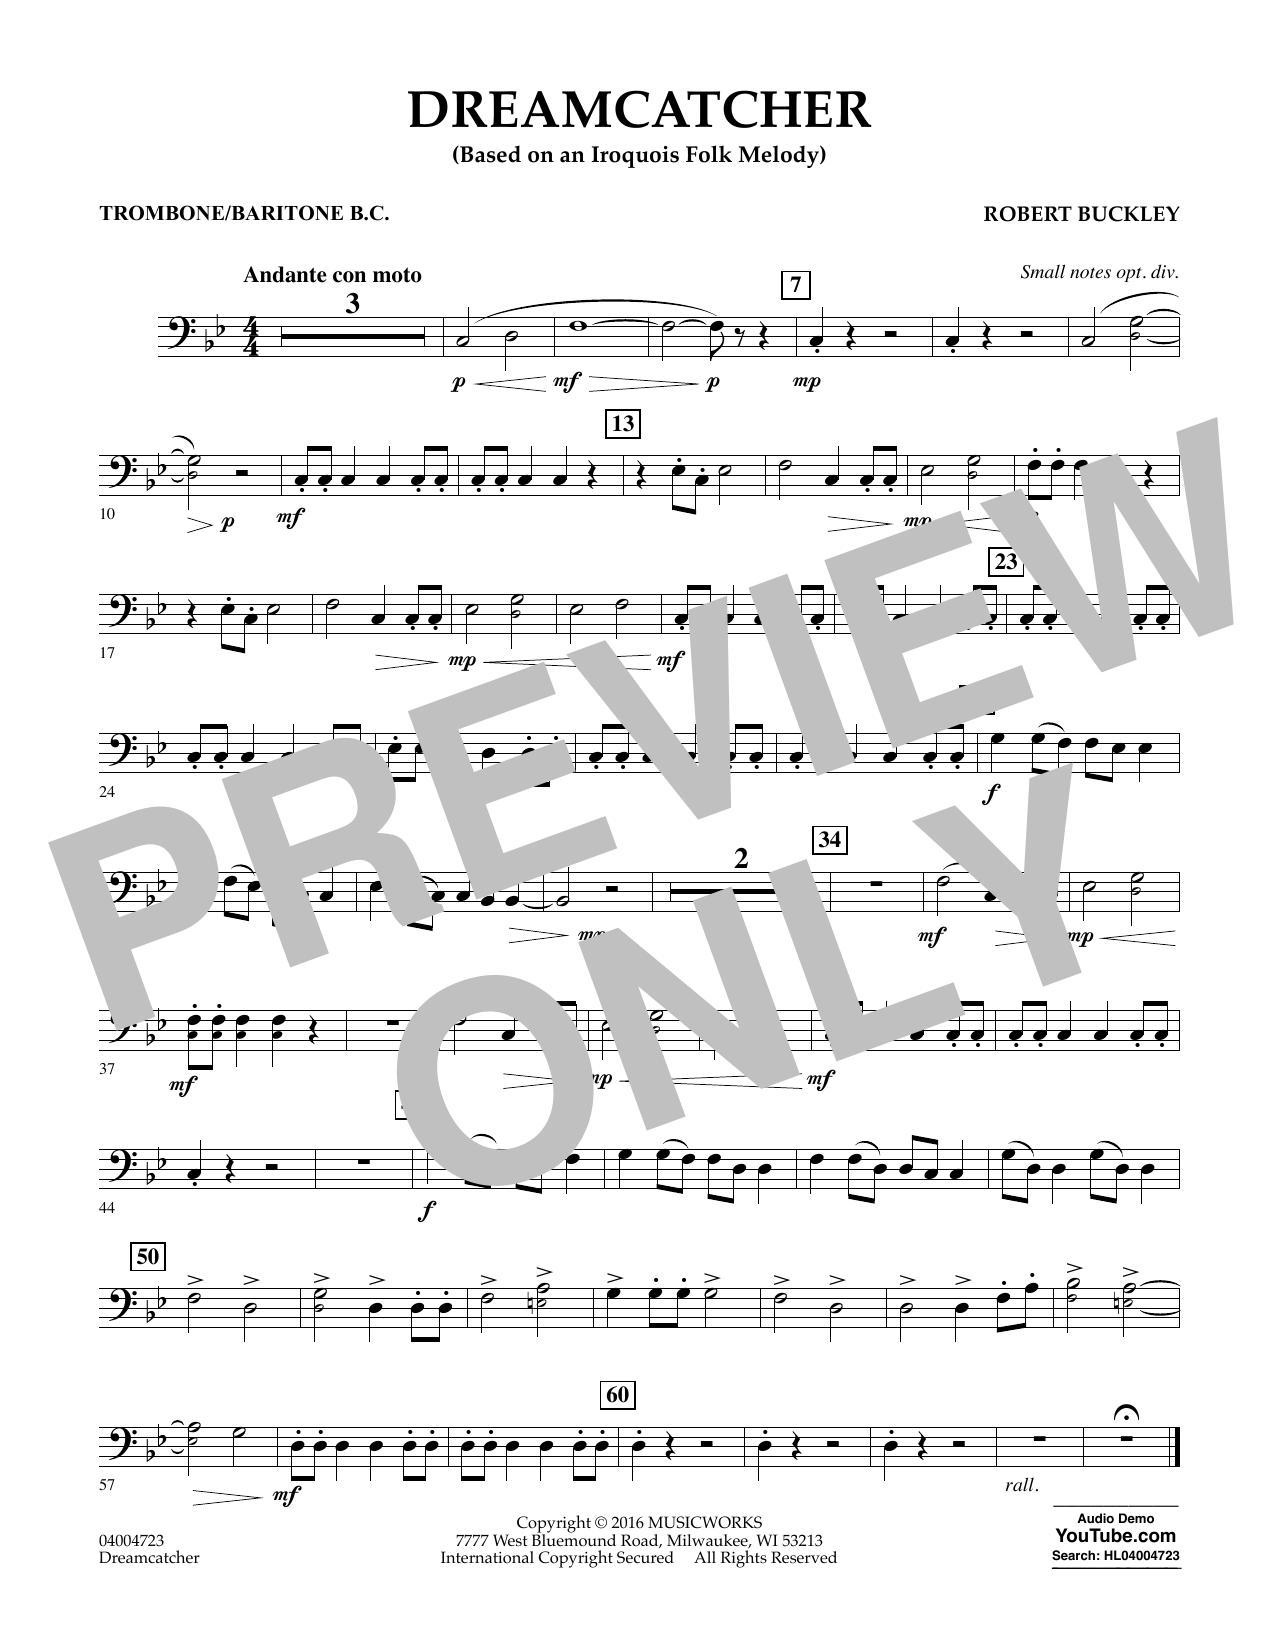 Dreamcatcher - Trombone/Baritone B.C. (Concert Band)